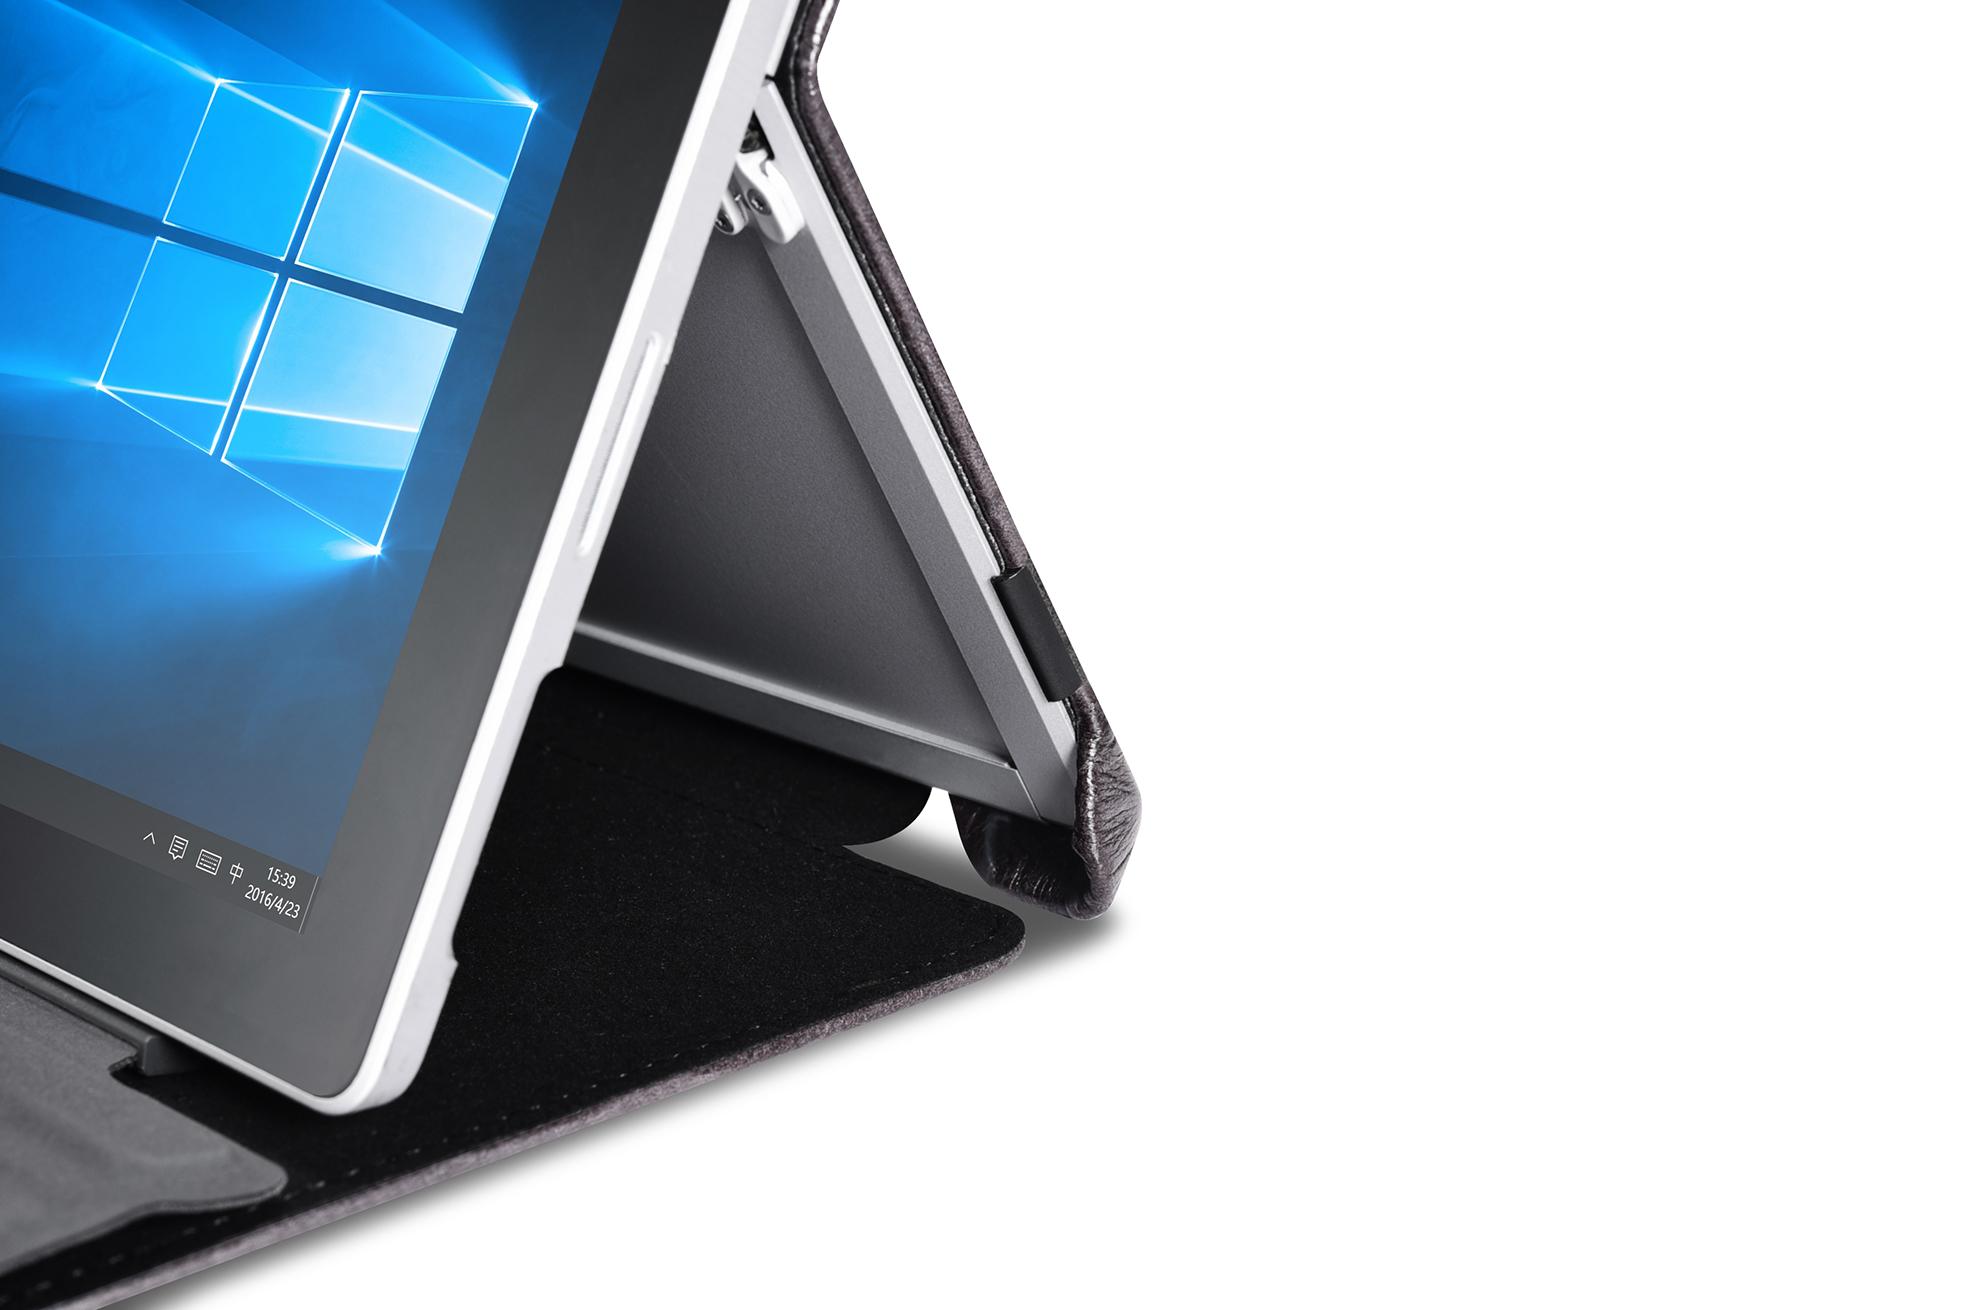 Ốp da Surface Pro 4 / Pro 5/ Pro 6 / Pro 7 ICARER - Hàng chính hãng